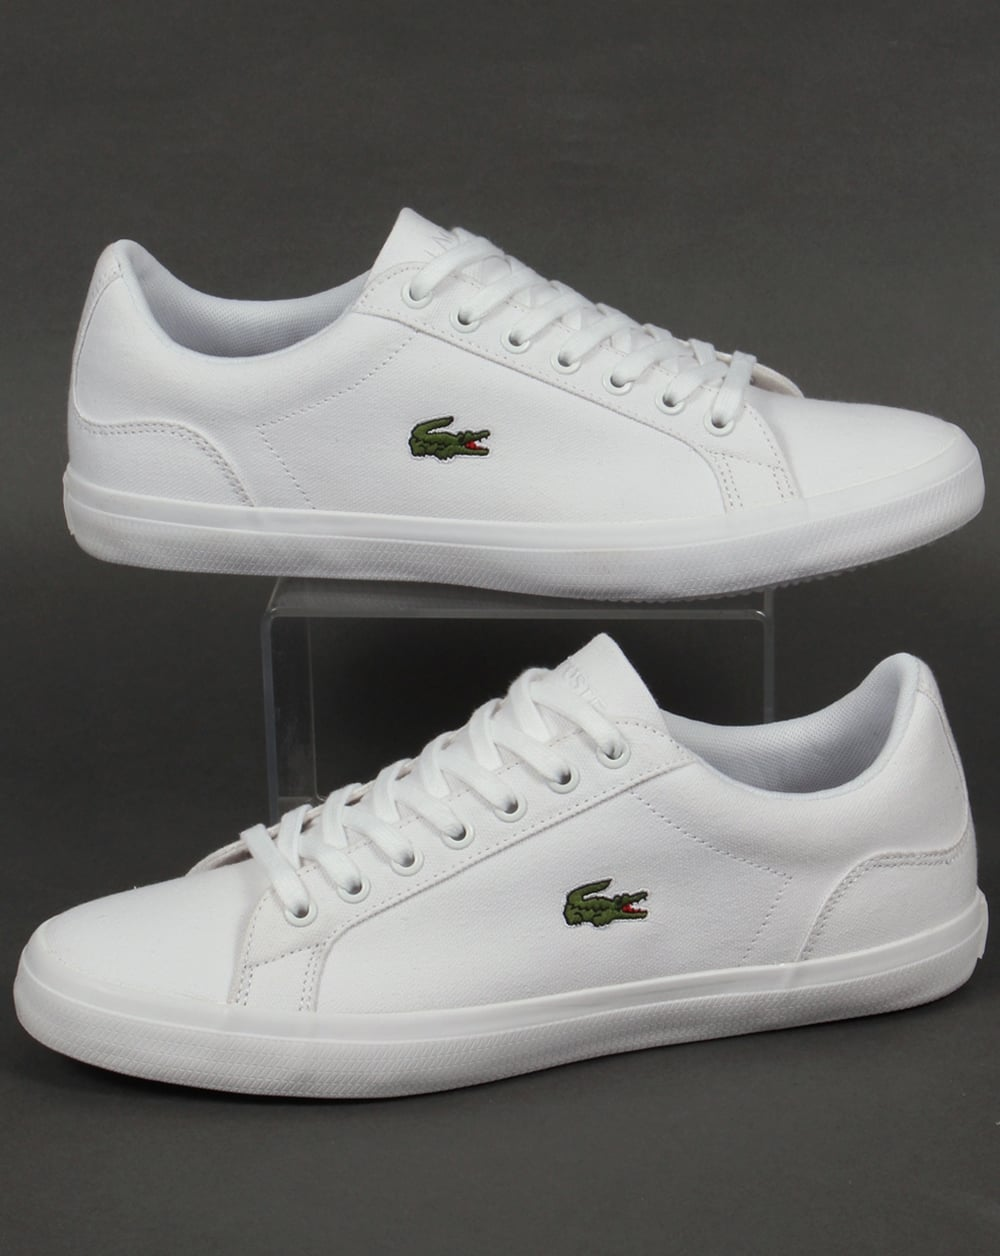 05a8683061c9 Lacoste Lacoste Lerond Canvas Trainers White